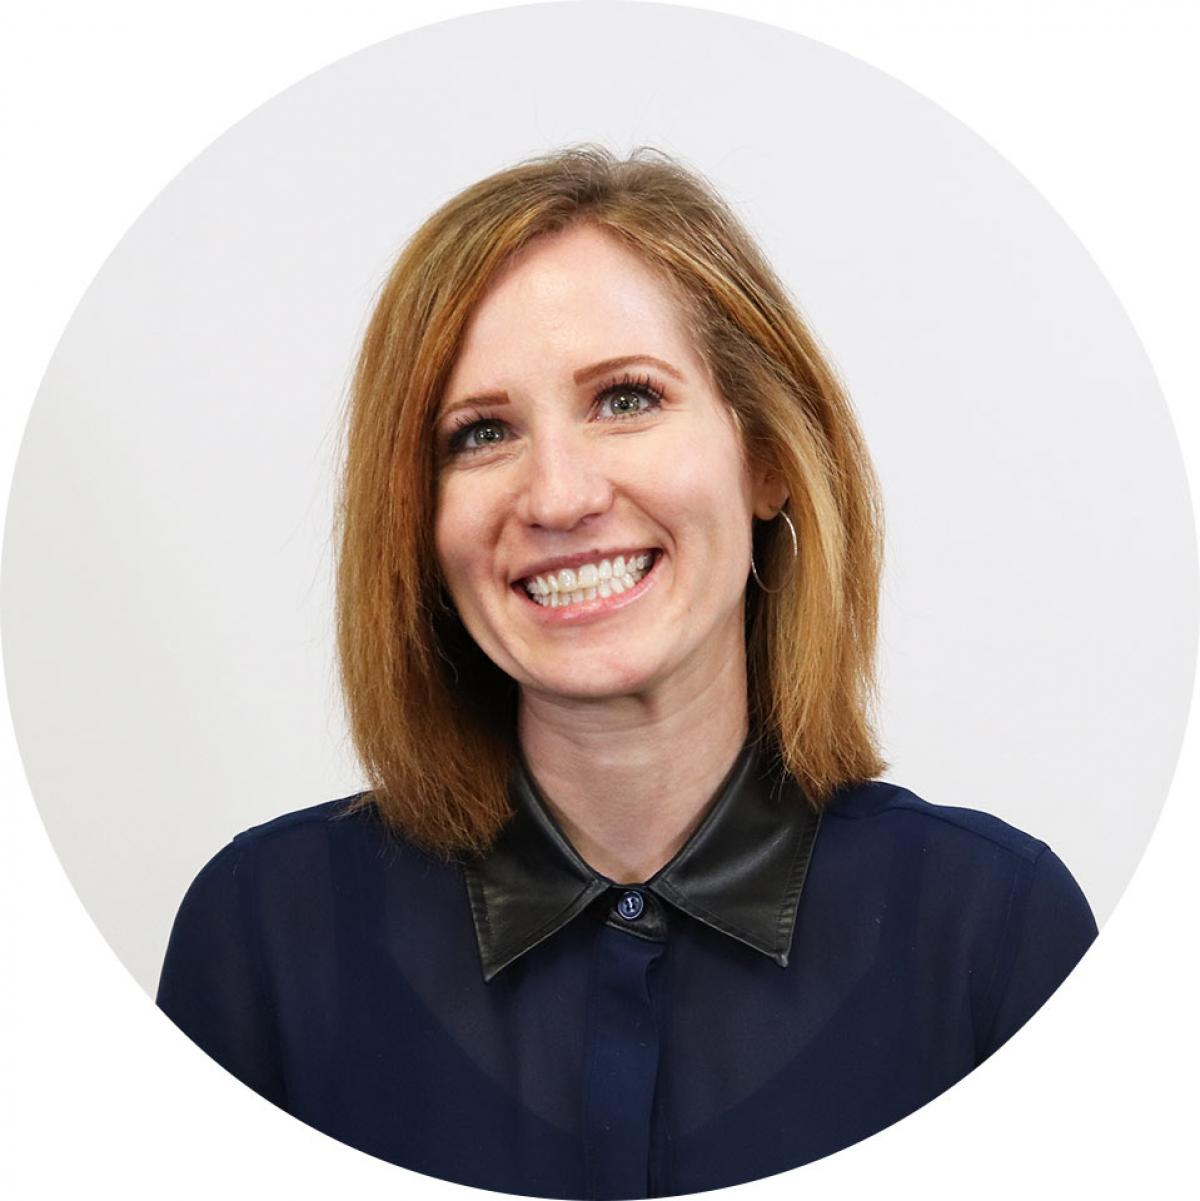 Sari Waldman Director, New Client Experience